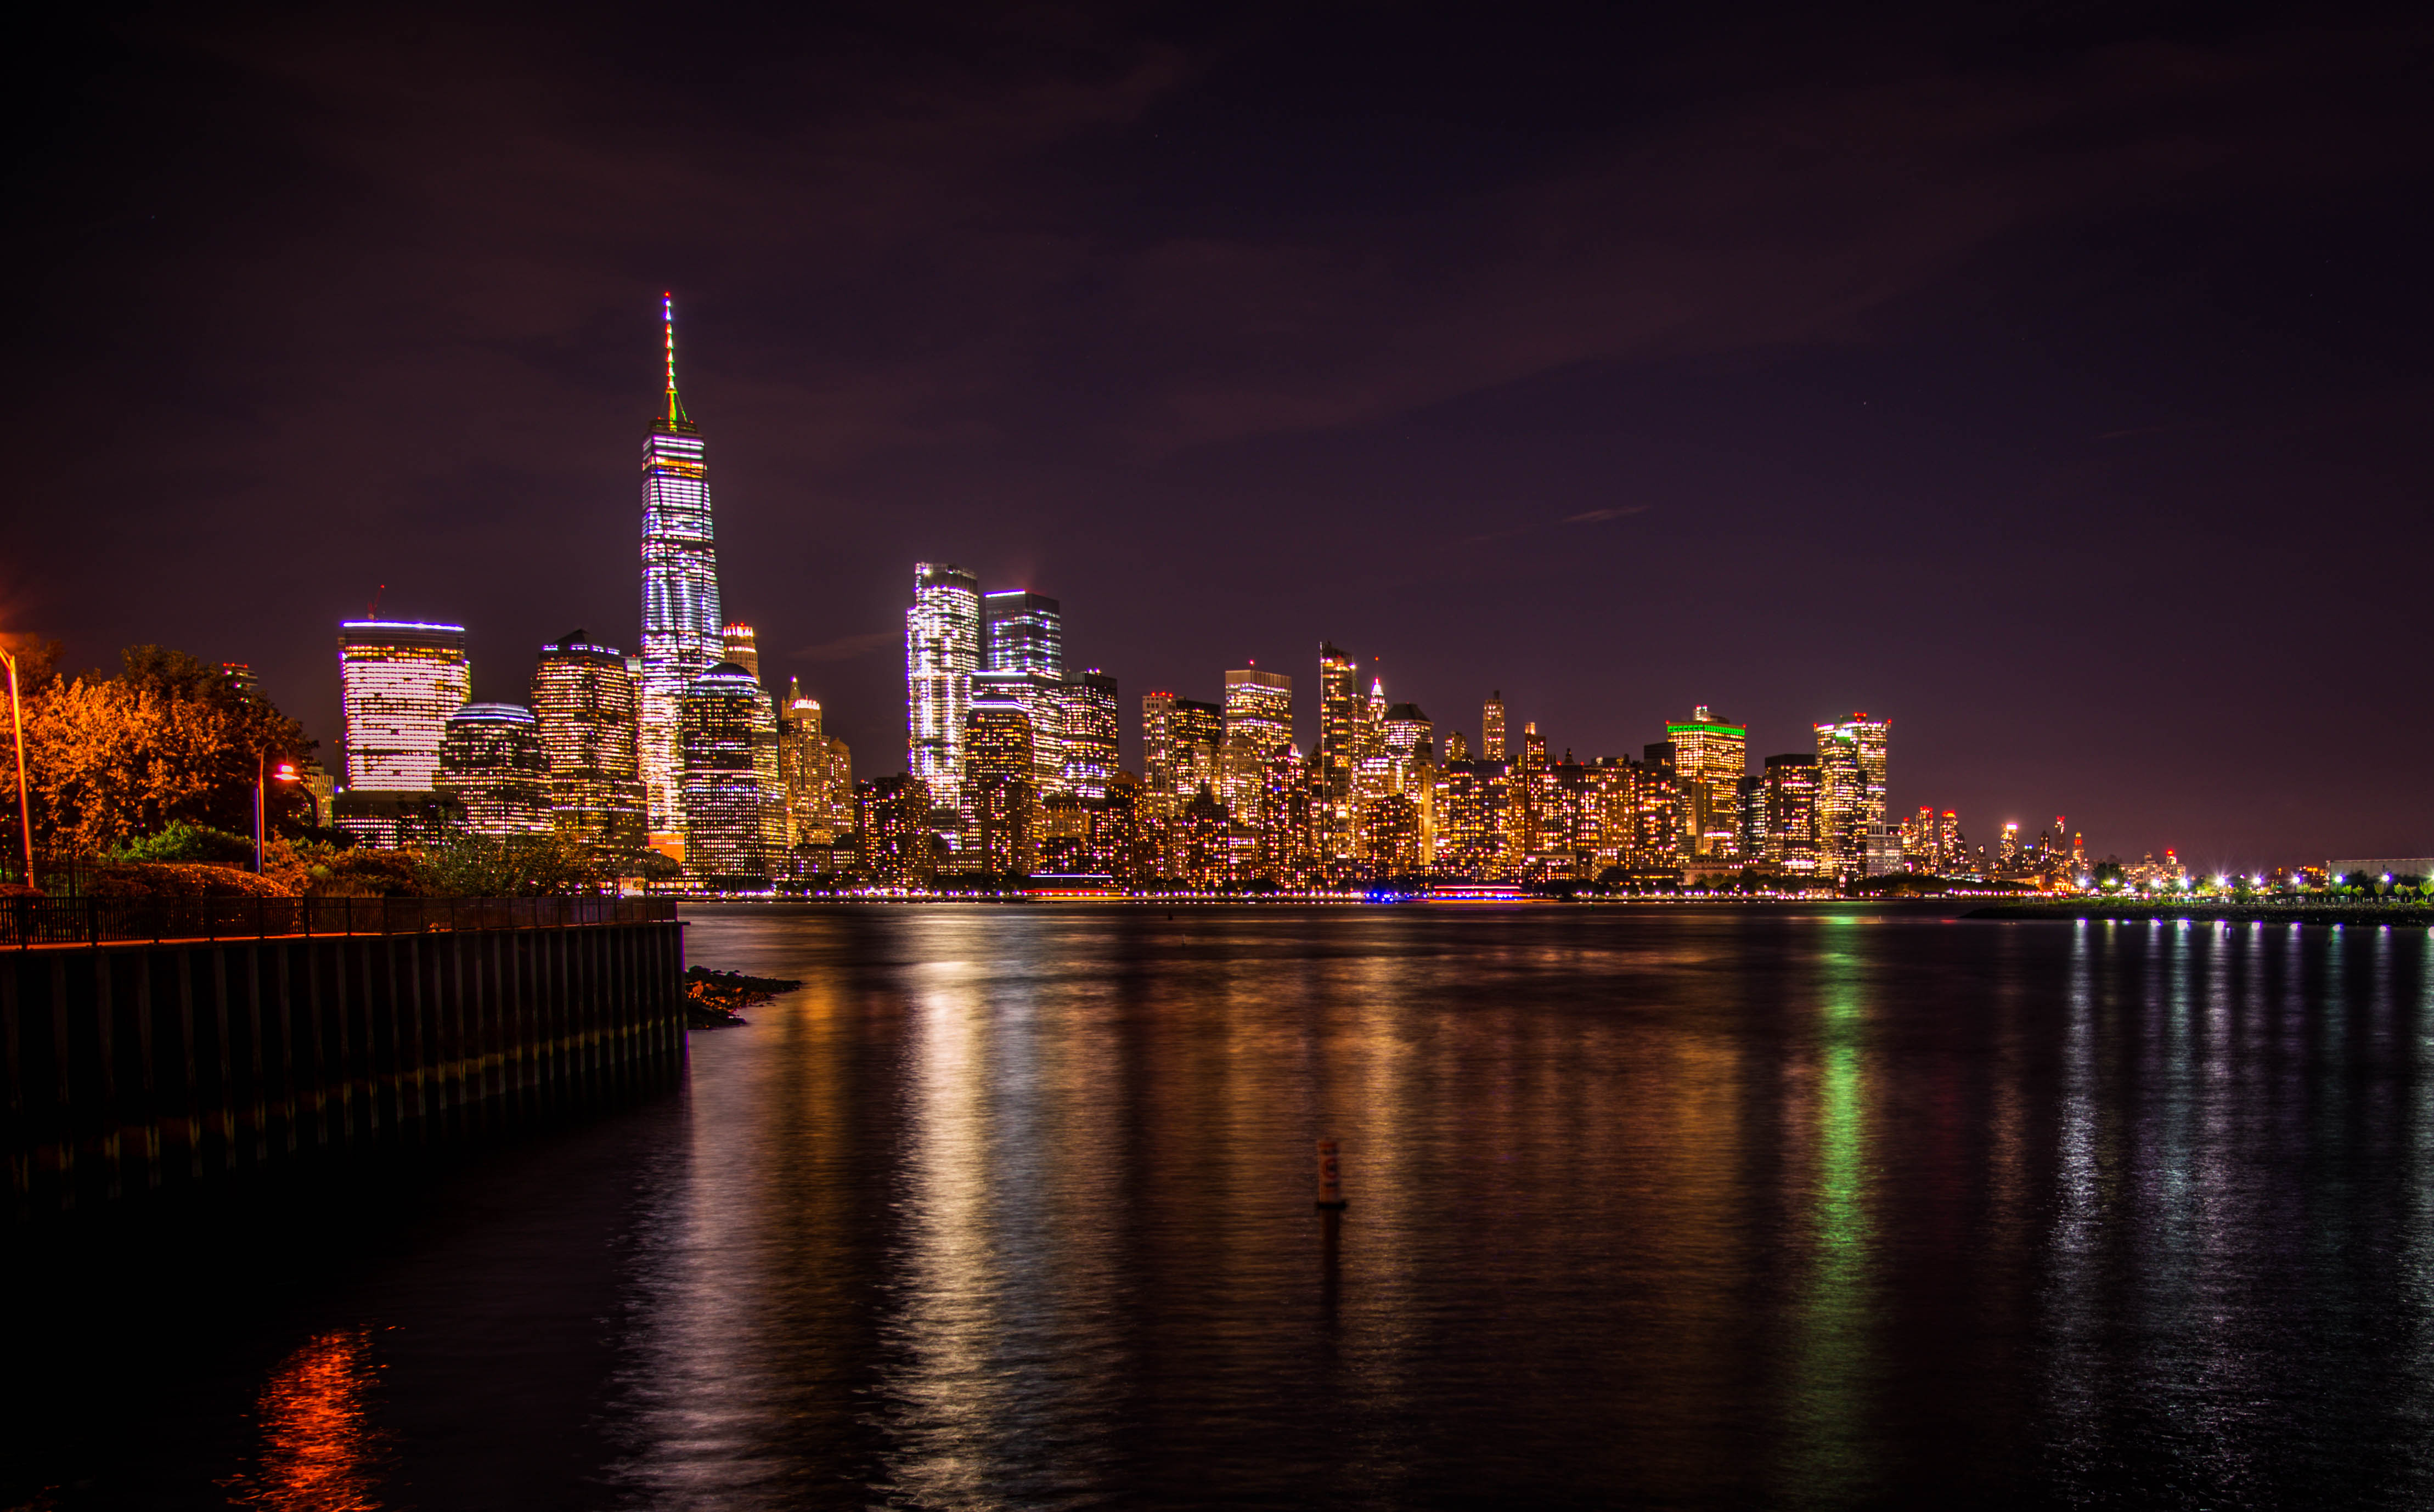 New York from across the Hudson.